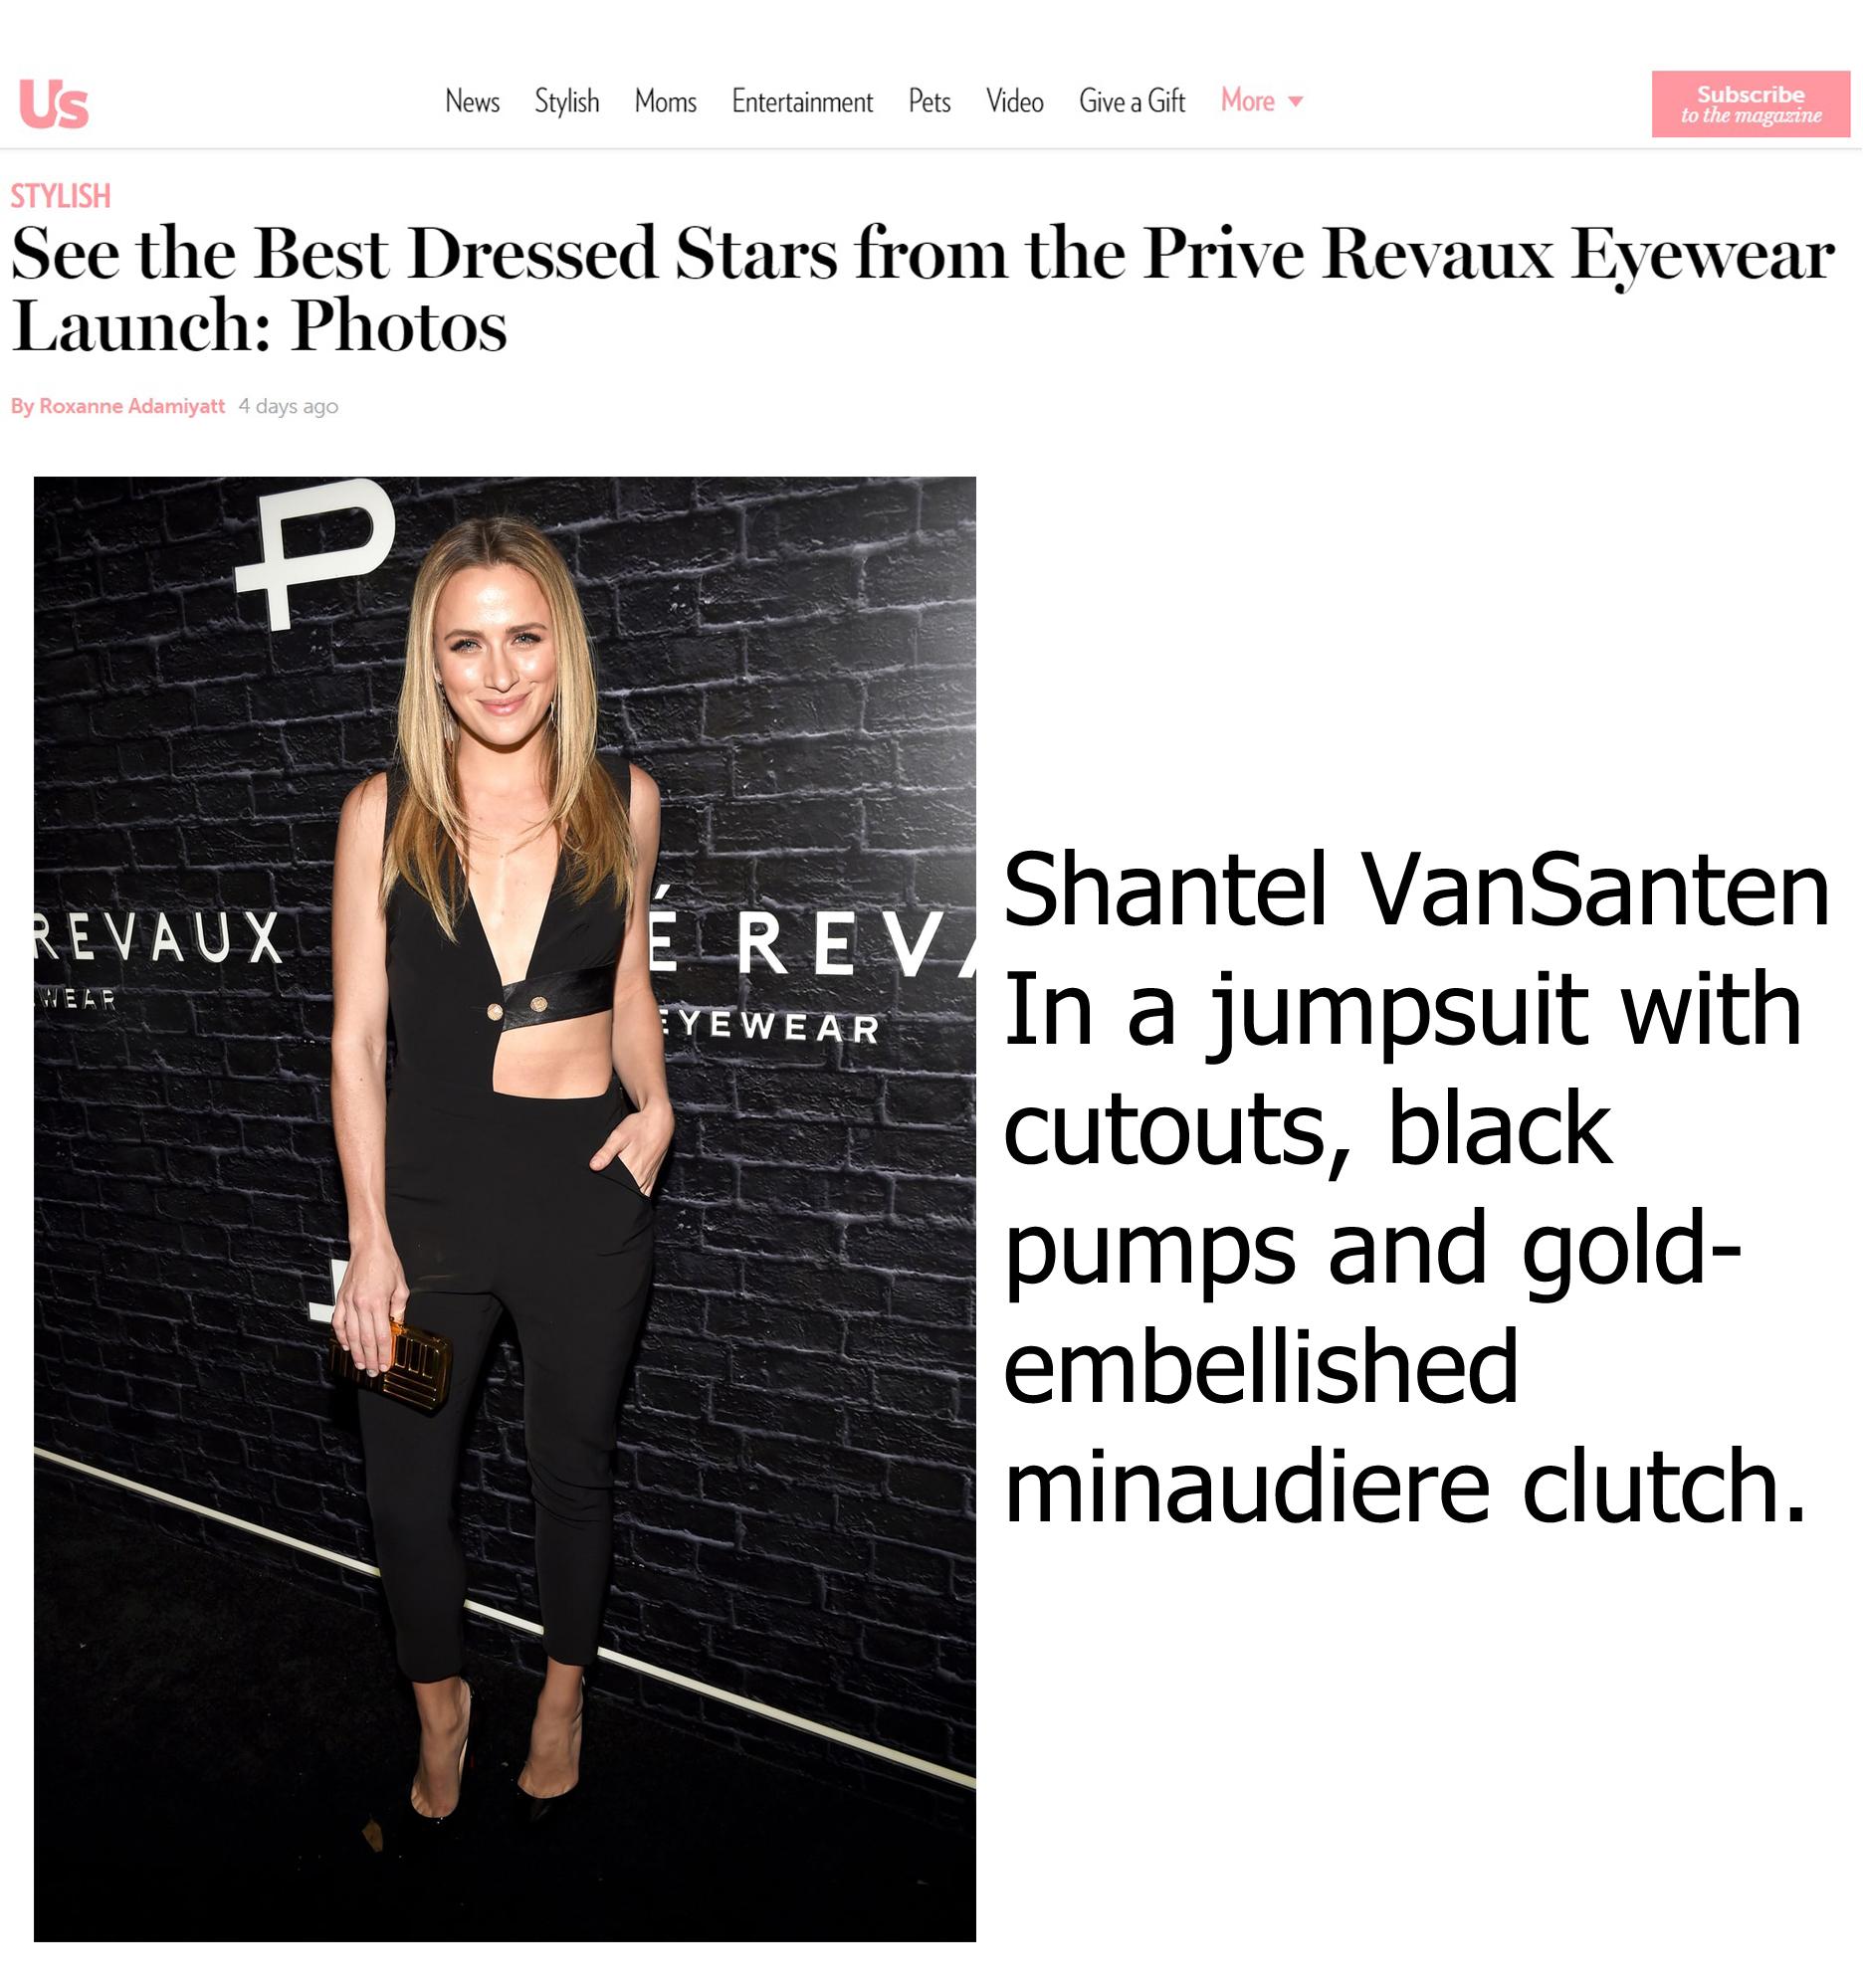 Shantel VanSanten Best Dressed